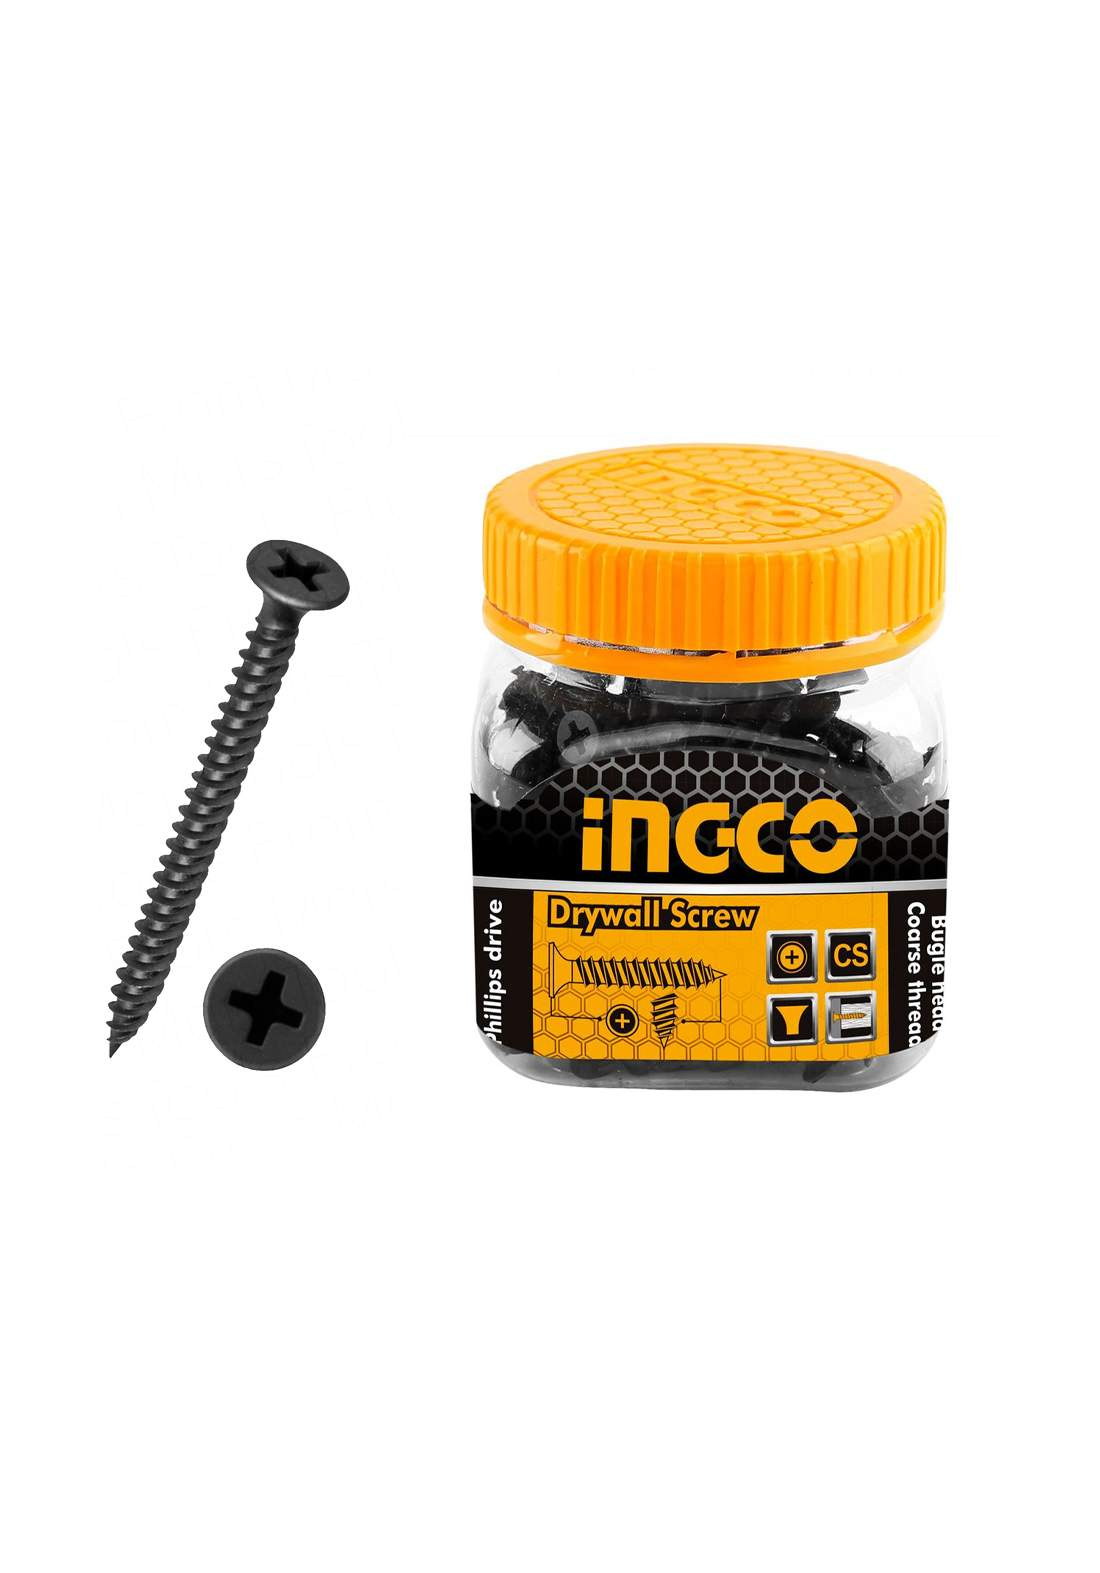 Ingco HWDS3503821 Drywall screw ST3.5 * 35 mm علبة براغي